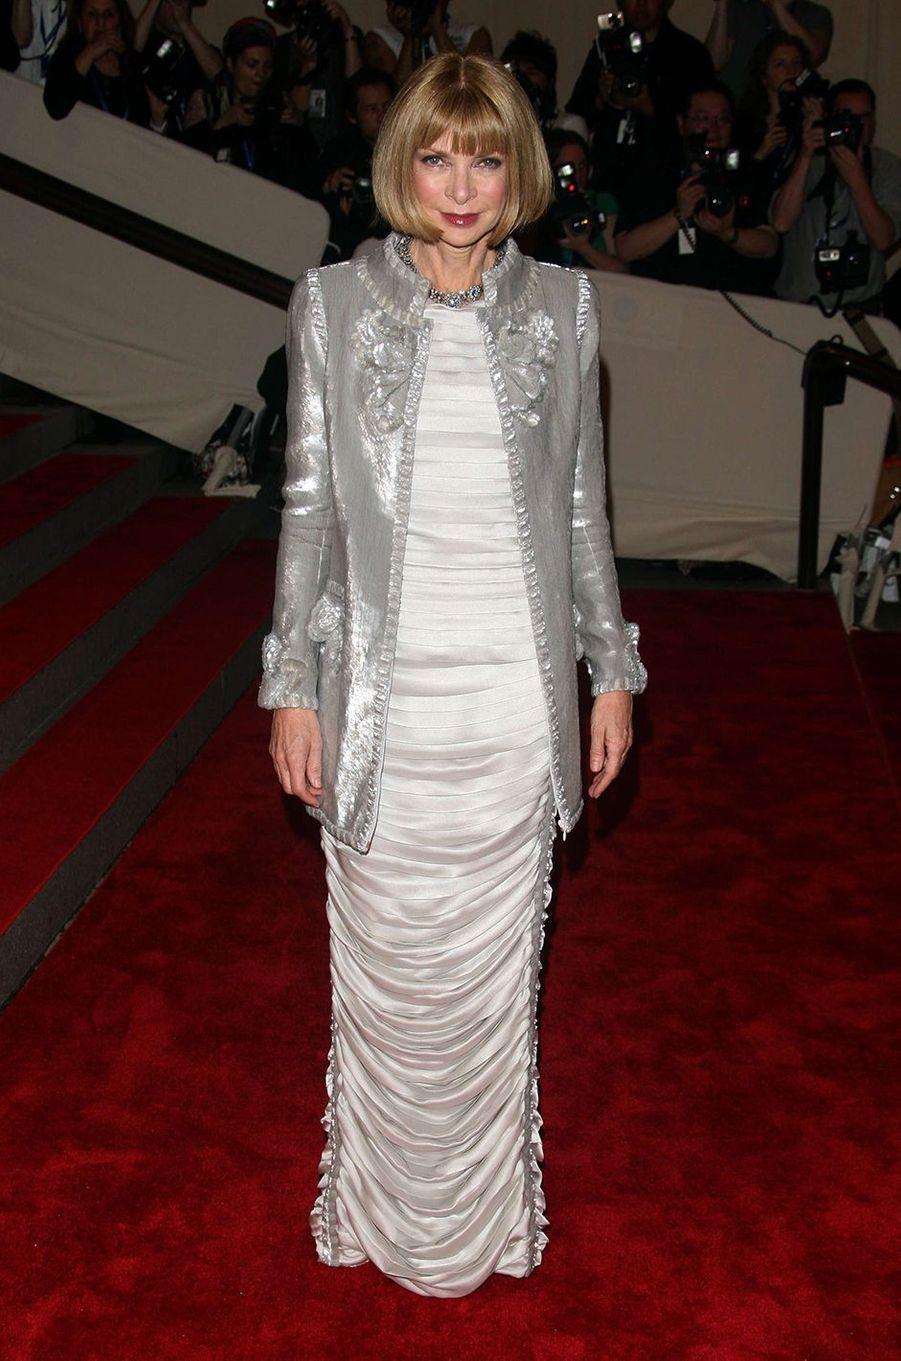 Anna Wintourau Met Gala à New York le 3 mai 2010